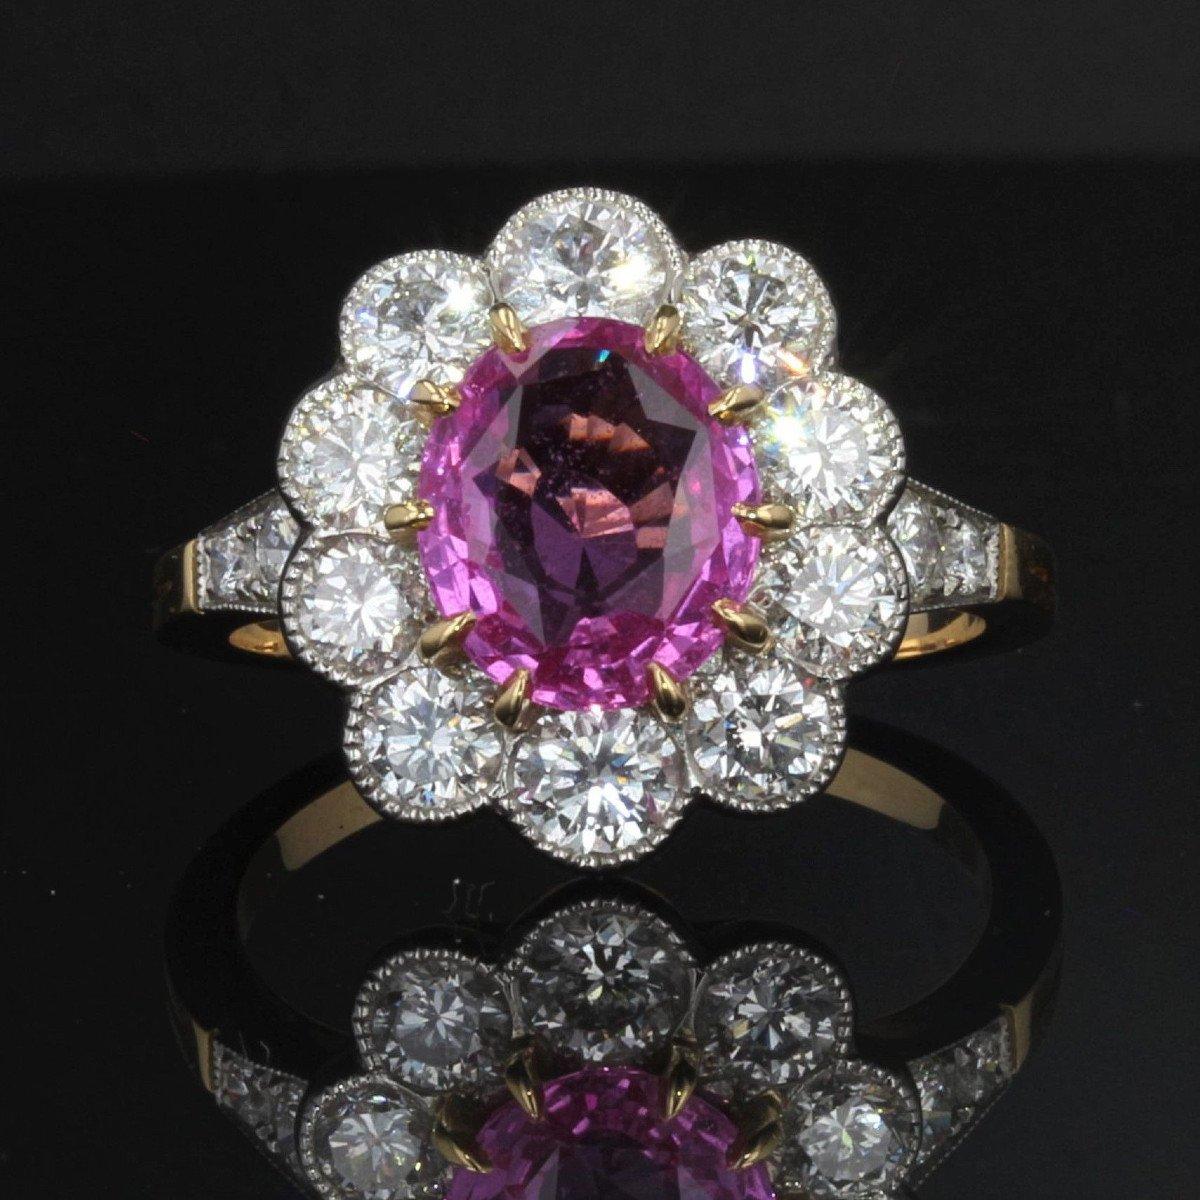 Bague Marguerite Saphir Rose Diamants Or Platine-photo-3